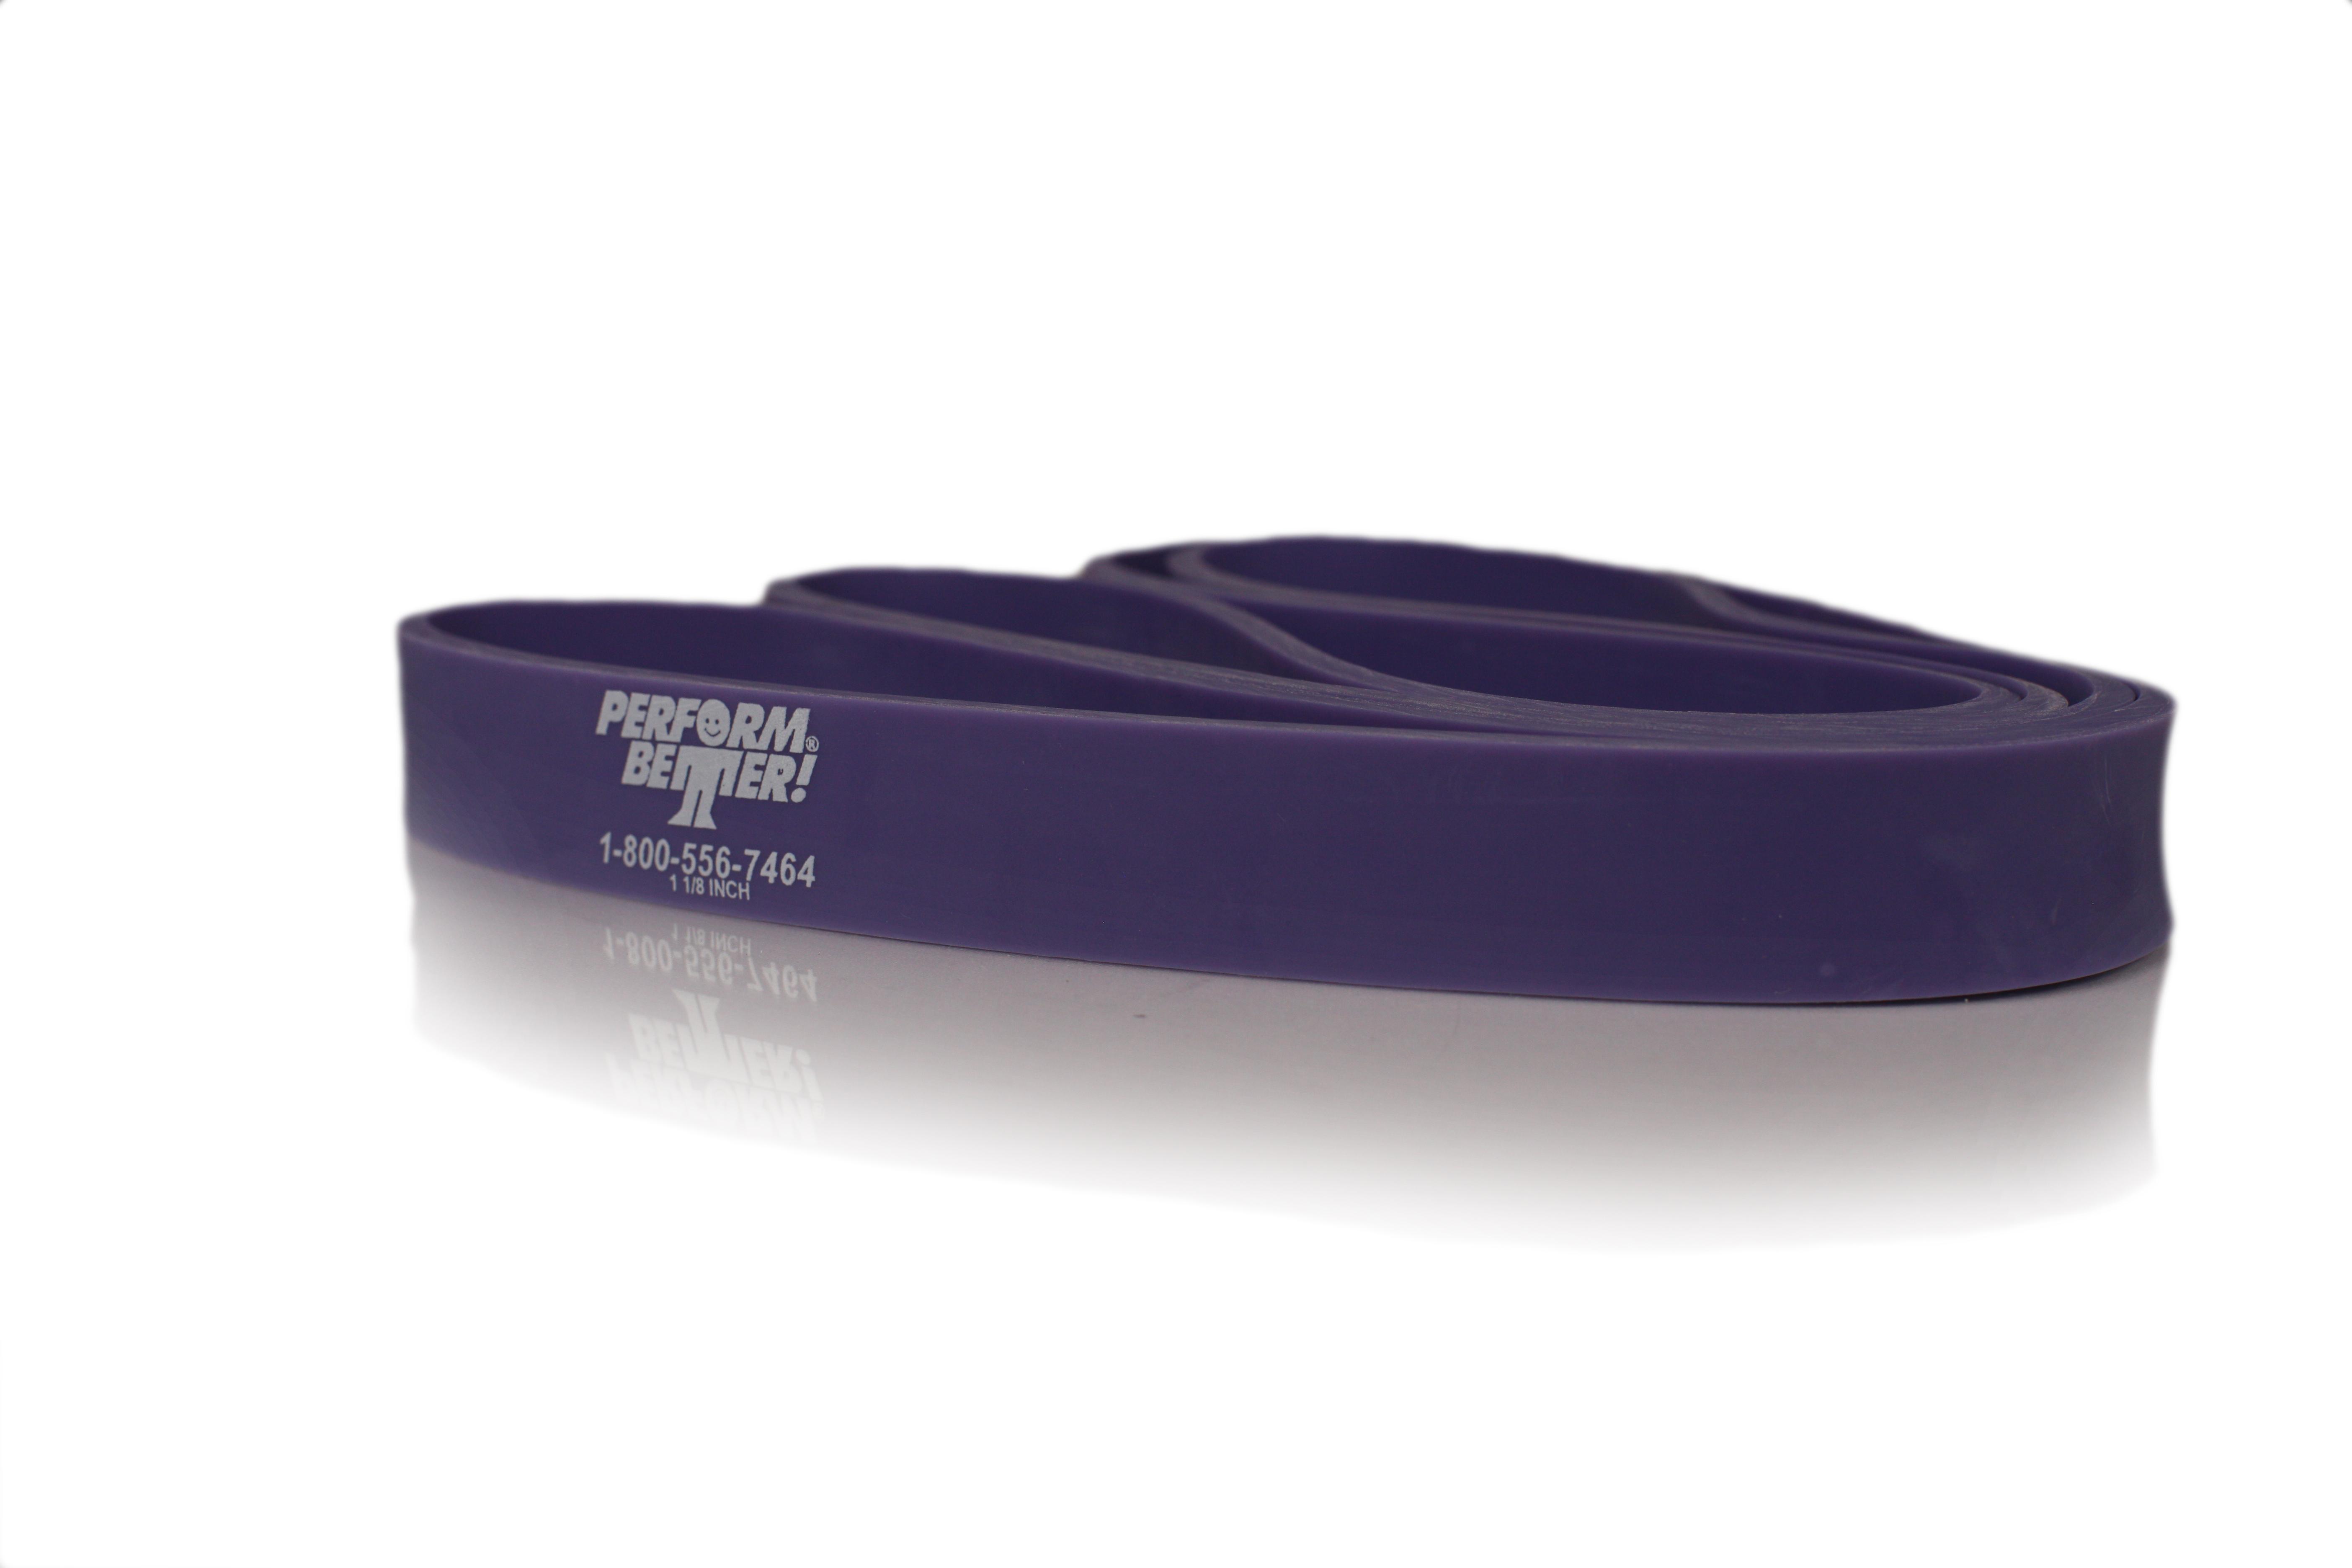 Superbands - 2,8 cm breit, 25 kg, lila (5mm dick)